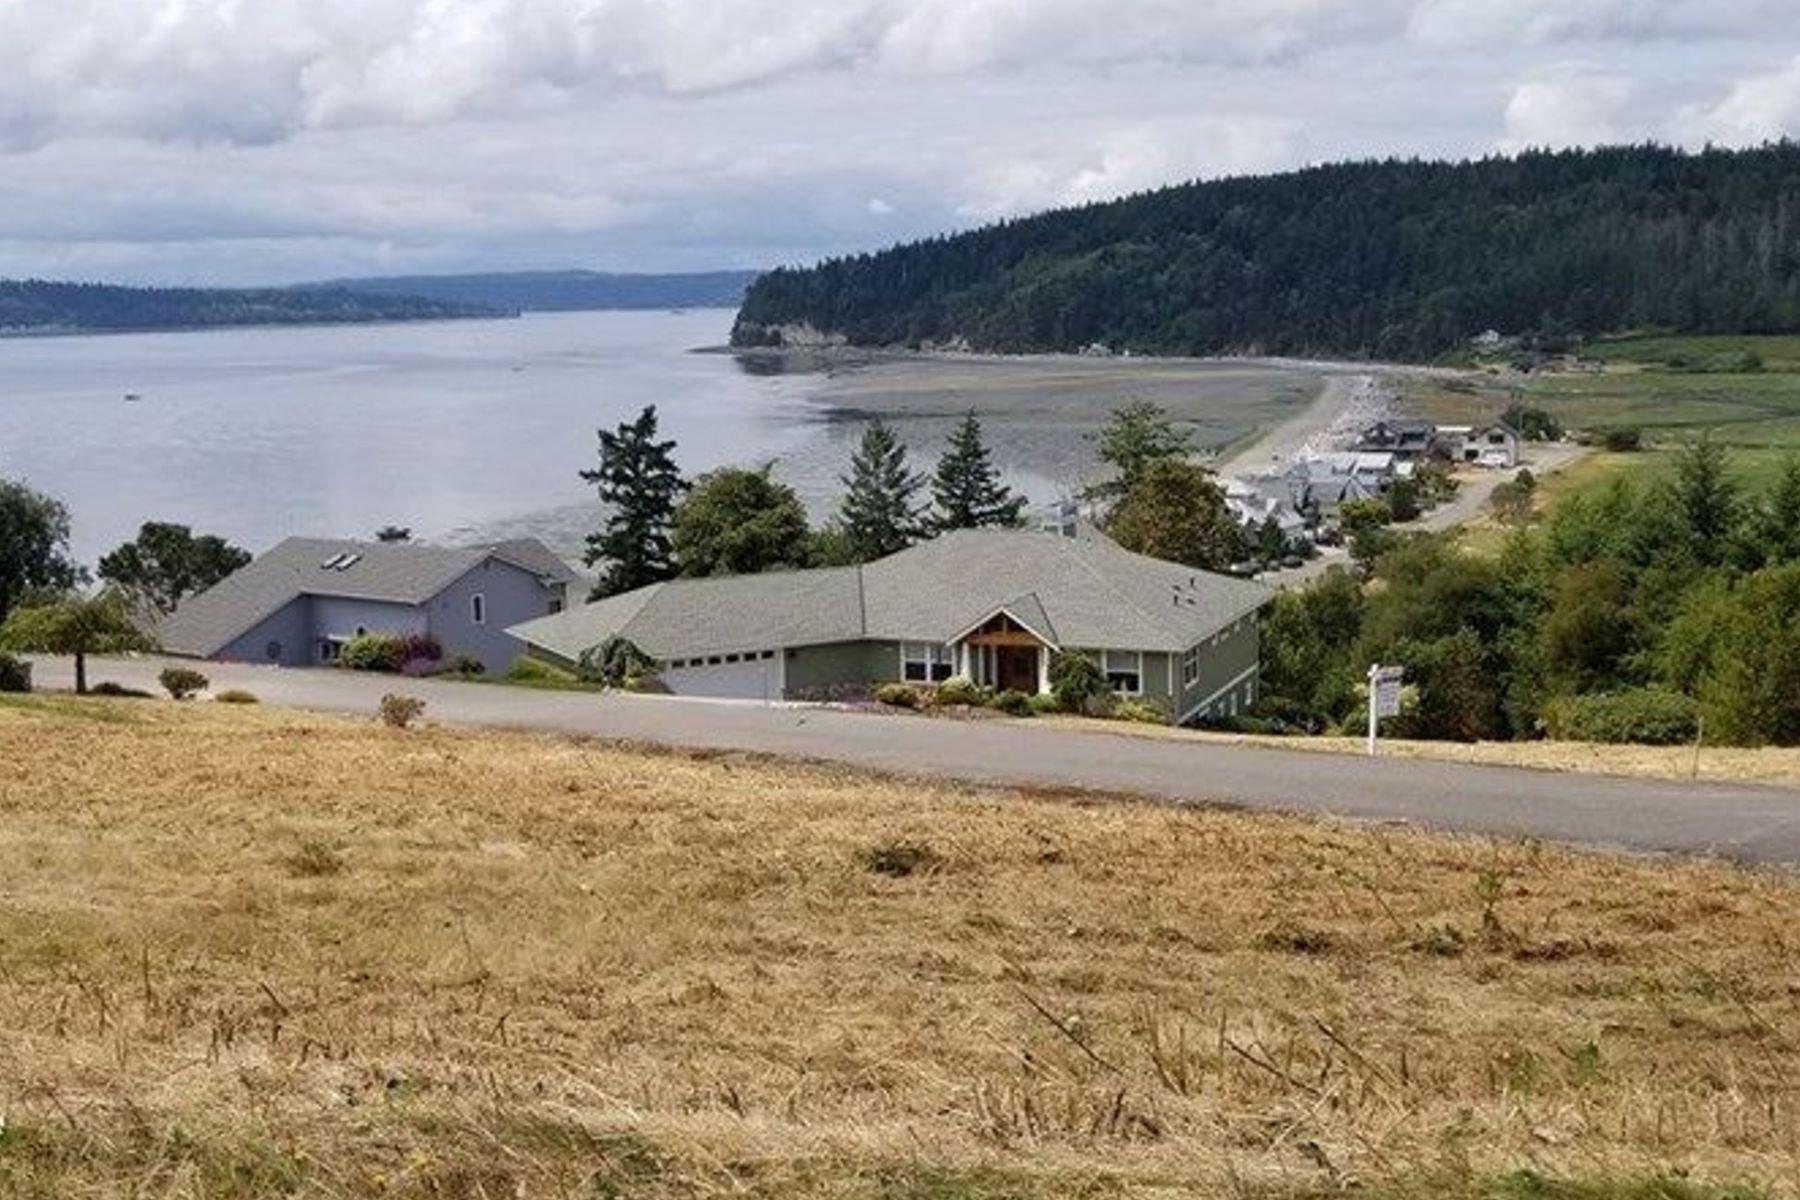 Land for Sale at Moana Dr, Camano Island, WA 98282 Moana Dr Camano Island, Washington 98282 United States